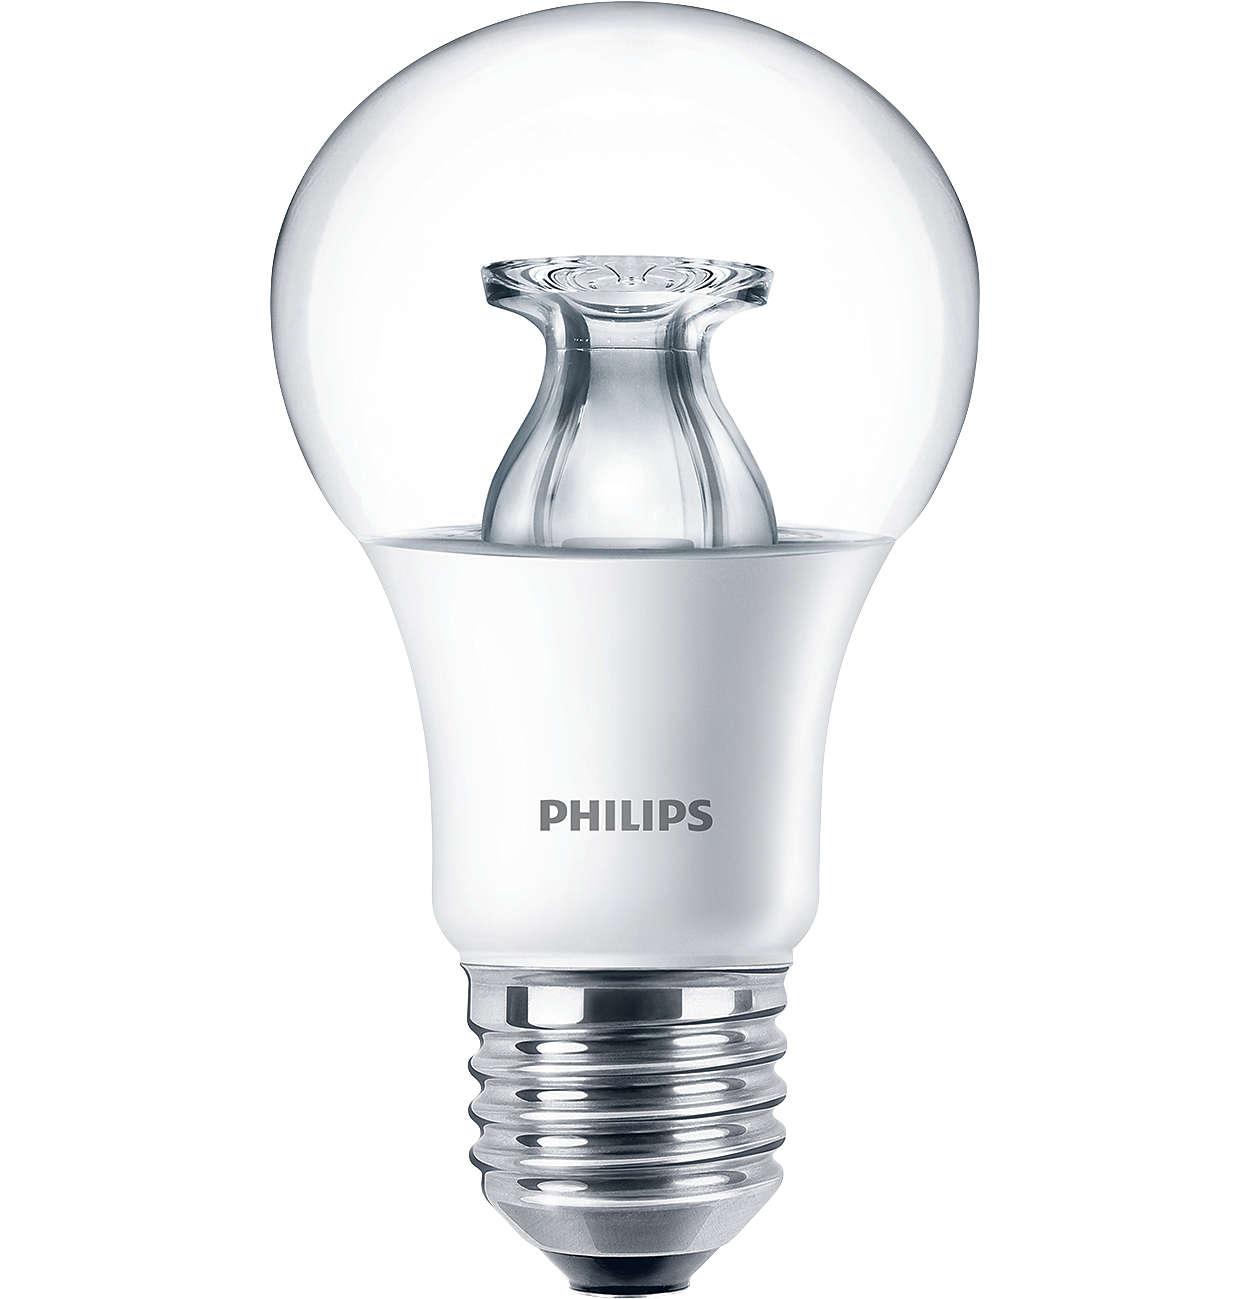 MASTER LEDbulb - Elegence meets efficiency